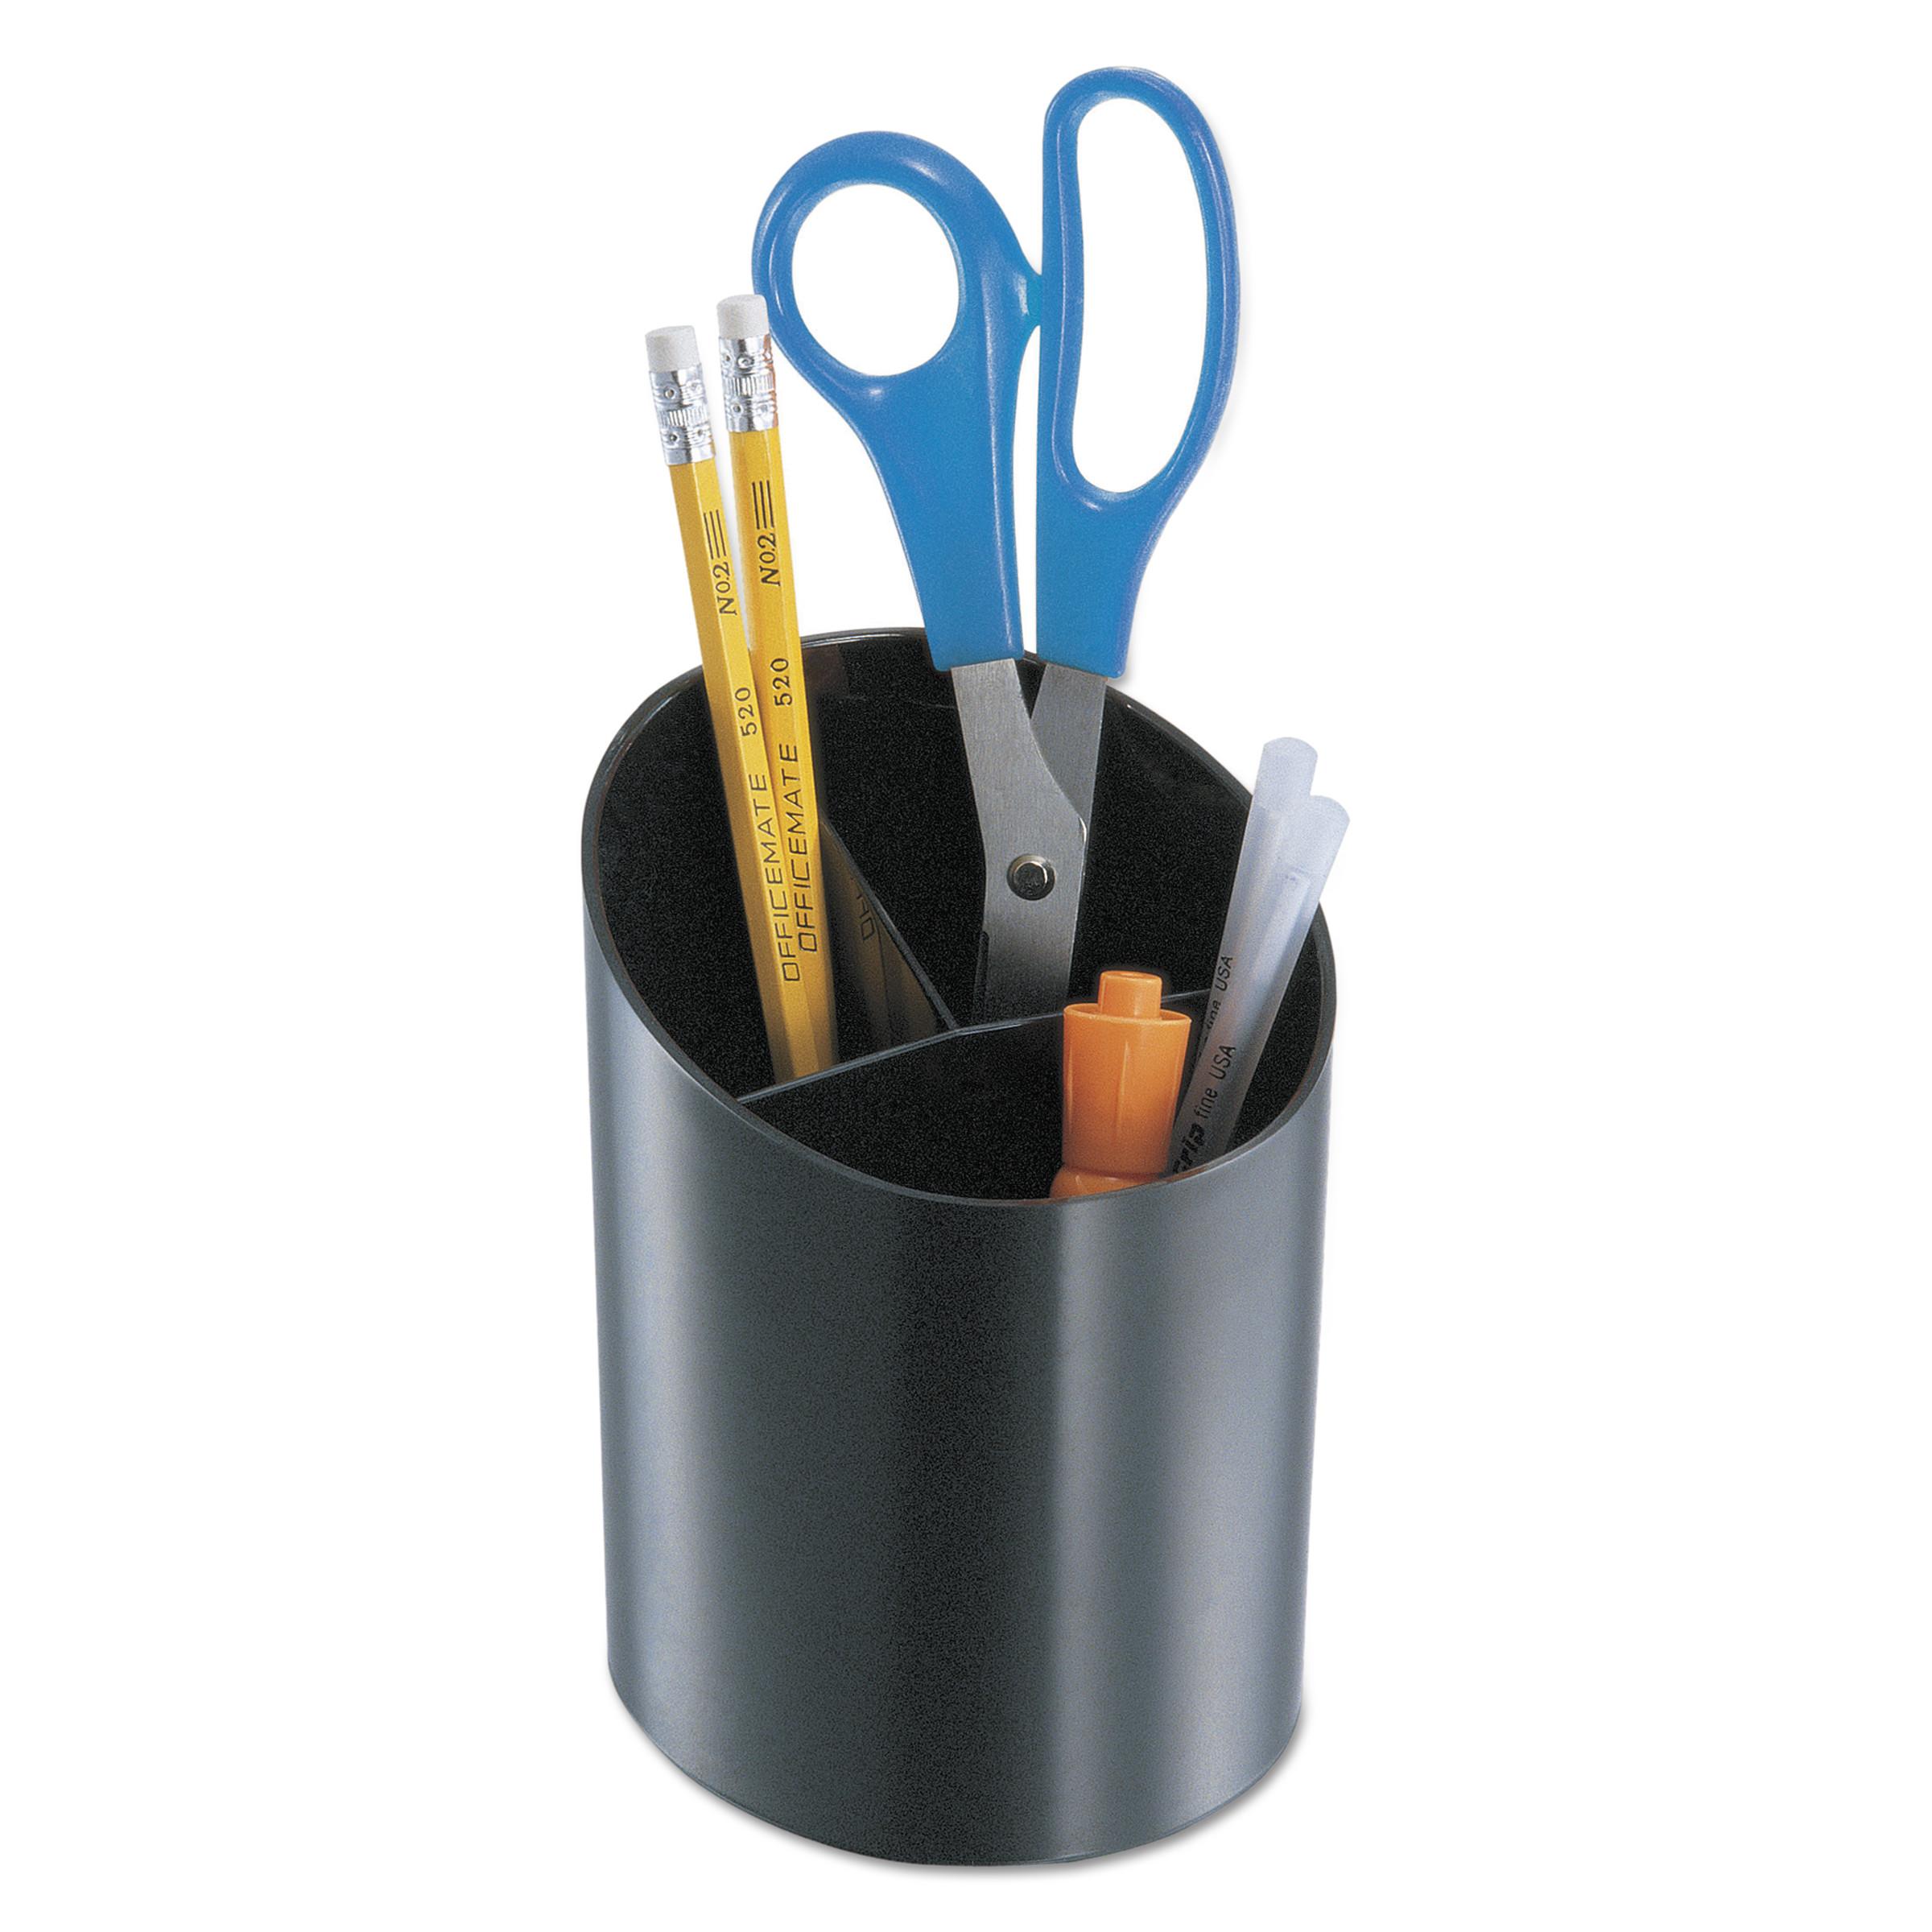 Universal Recycled Big Pencil Cup, Plastic, 4 1/4 dia. x 5 3/4, Black -UNV08108